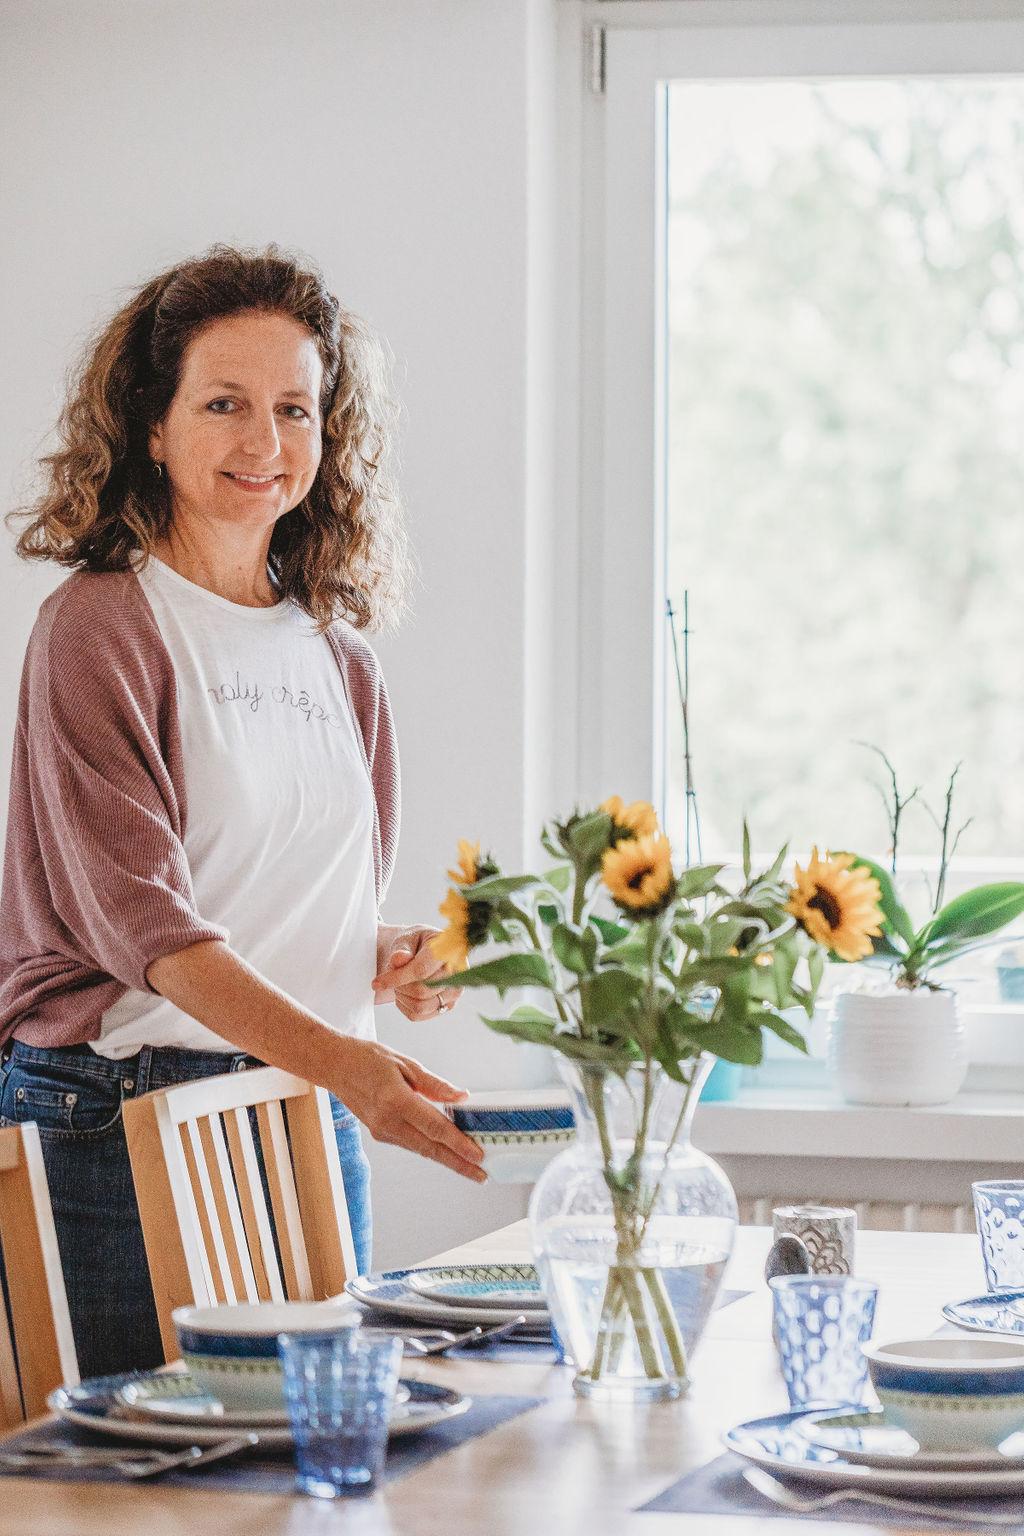 Angela Warm - Health Coach for expat moms